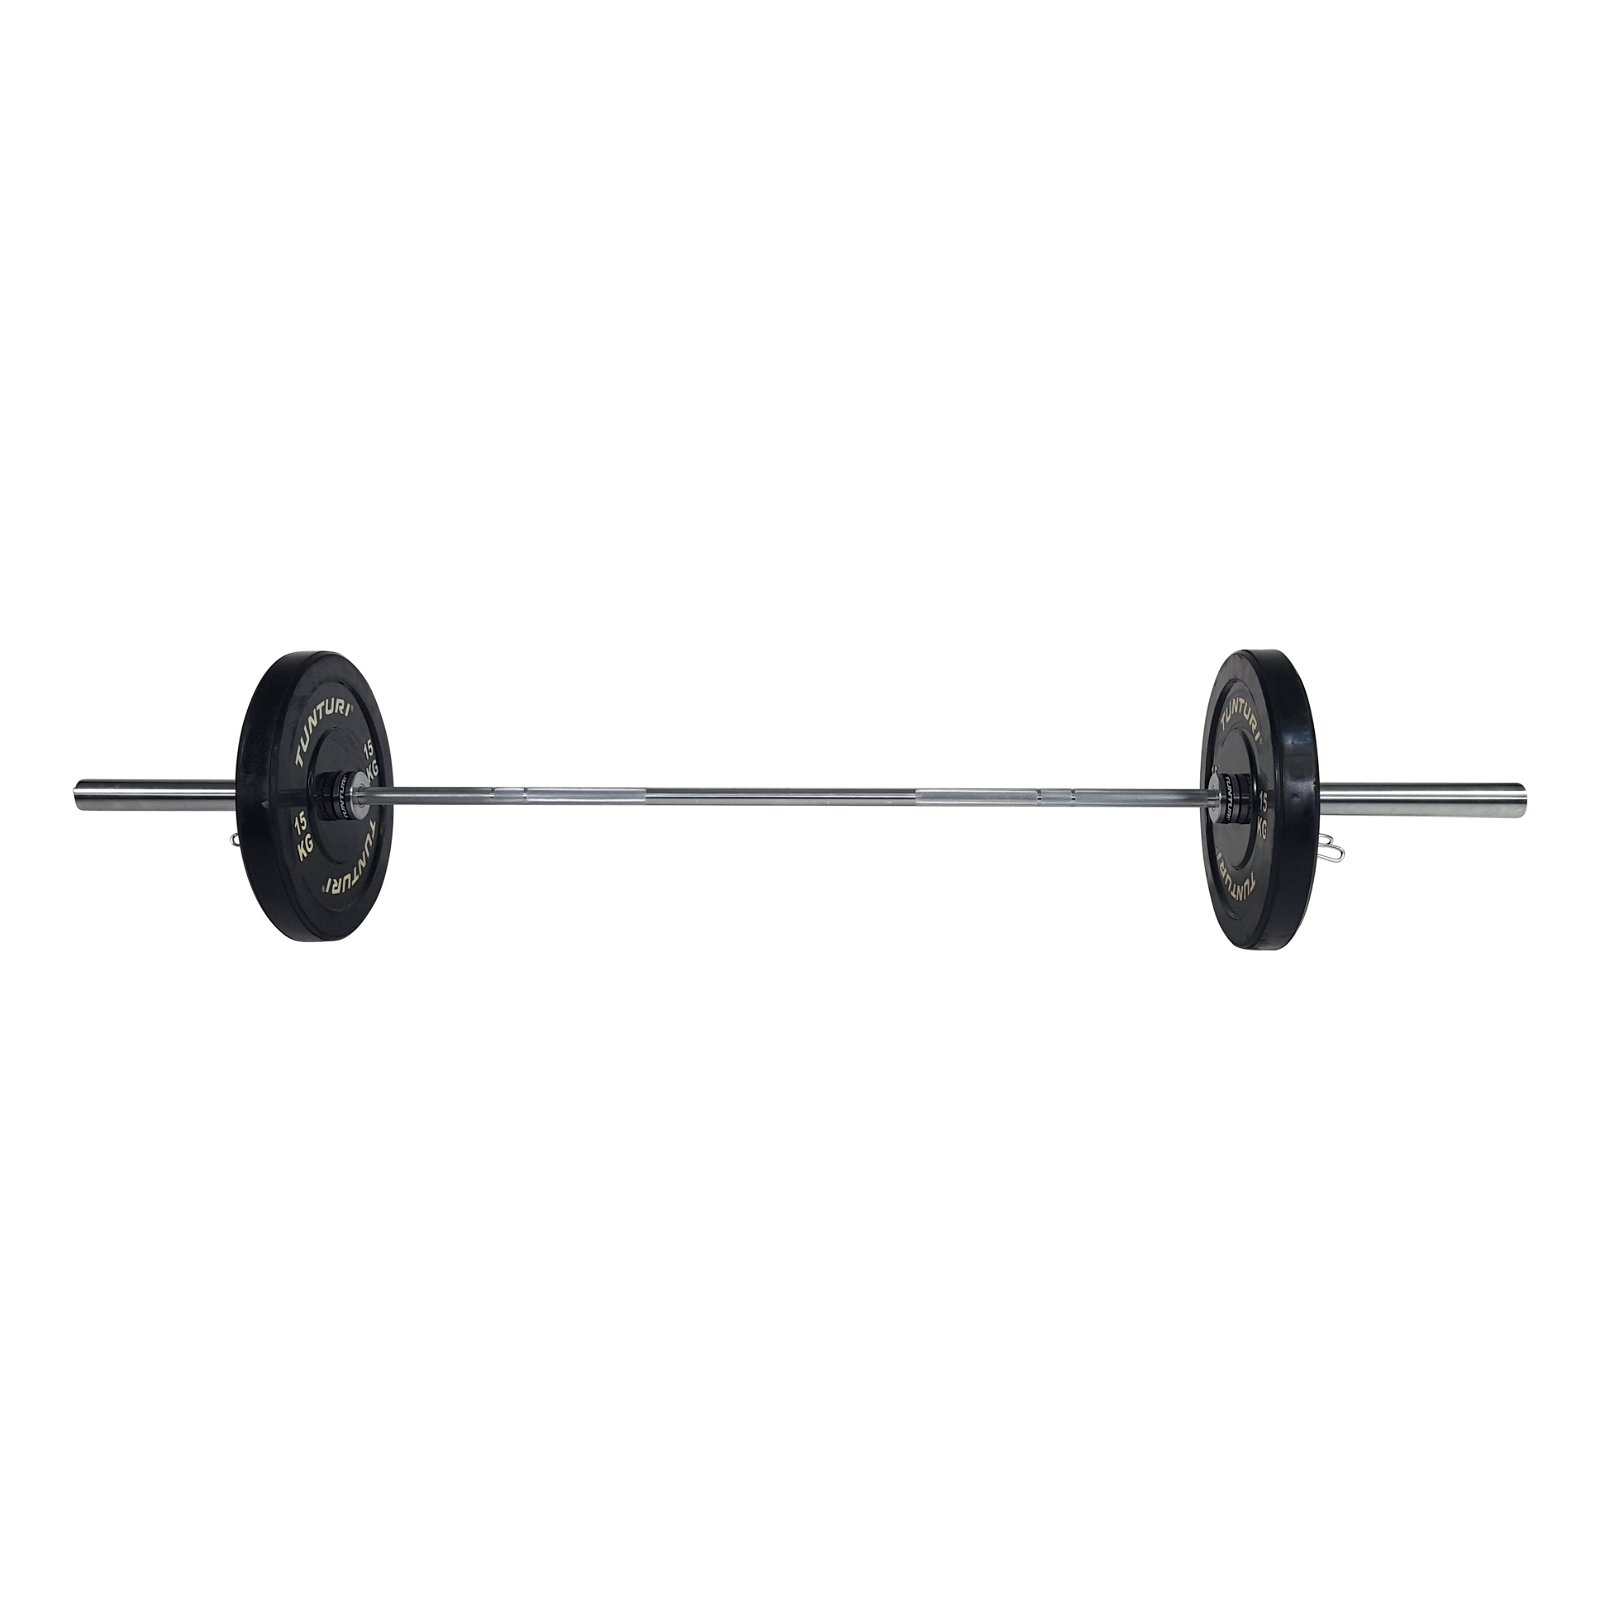 Tunturi Cross Fit Olympic Bar, 20kg, 220cm, 28mm handle